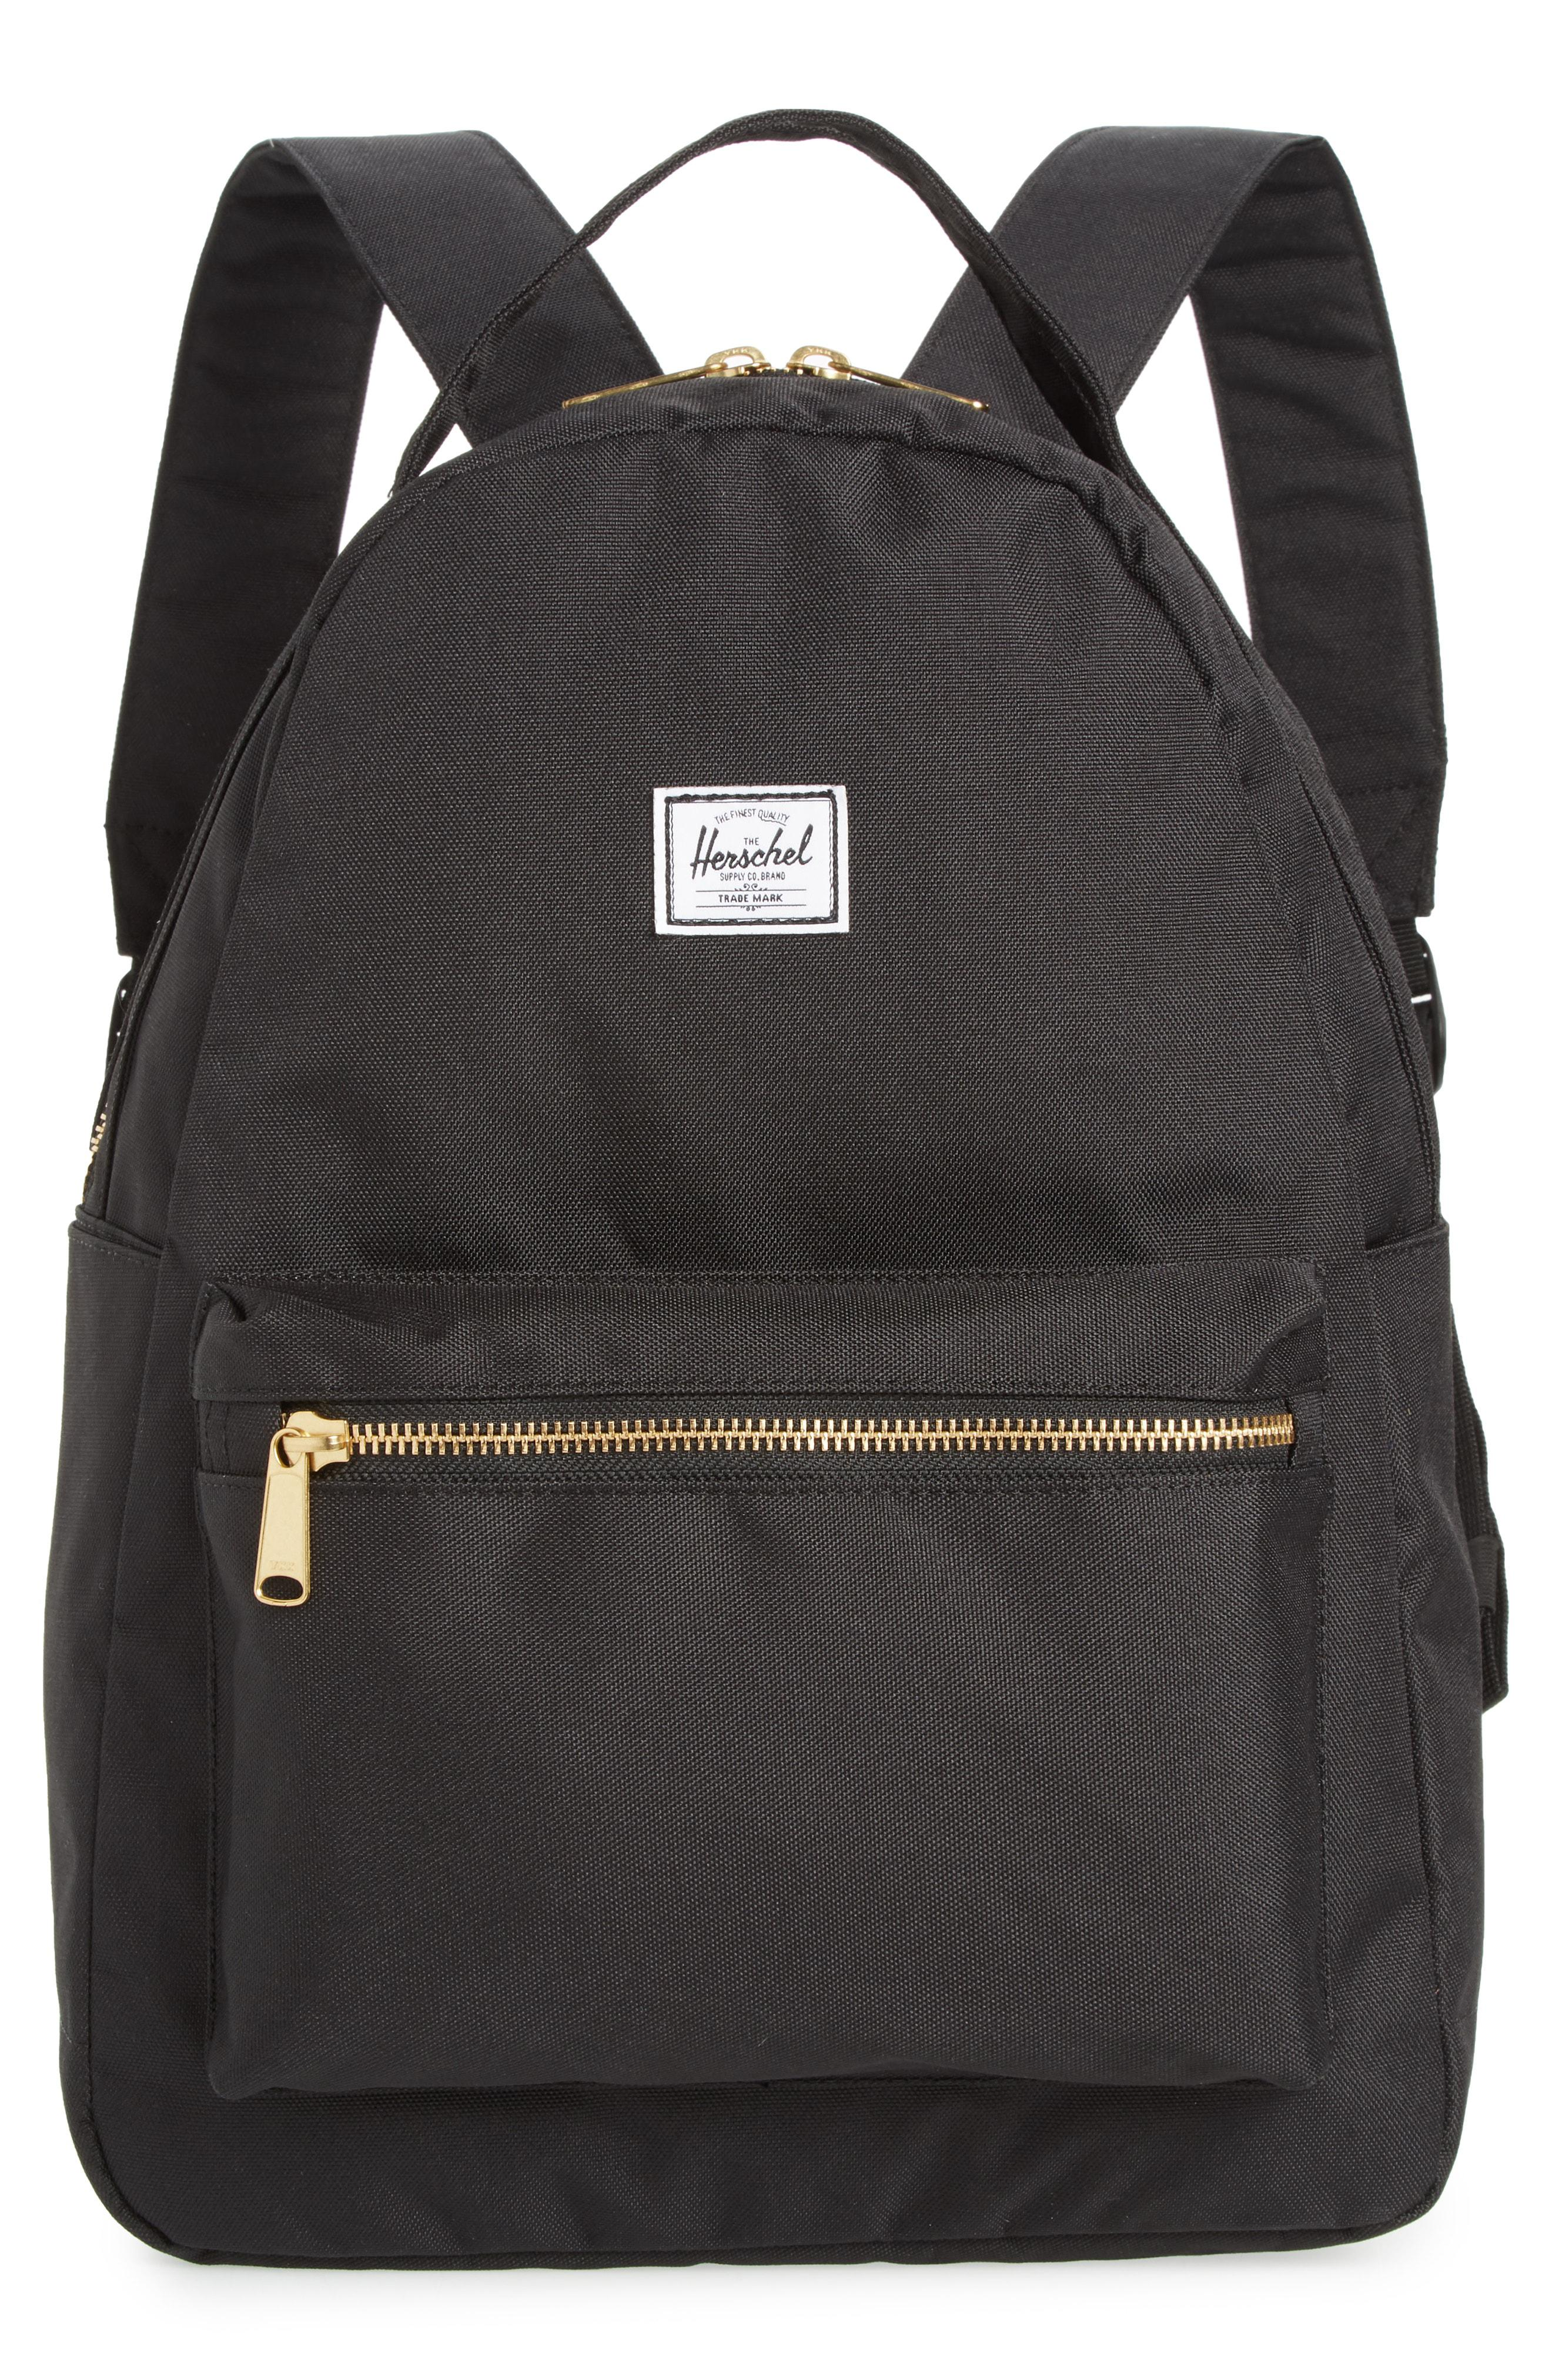 Lyst - Herschel Supply Co. Nova Mid Volume Backpack - in Black 1292e2efbe0b6